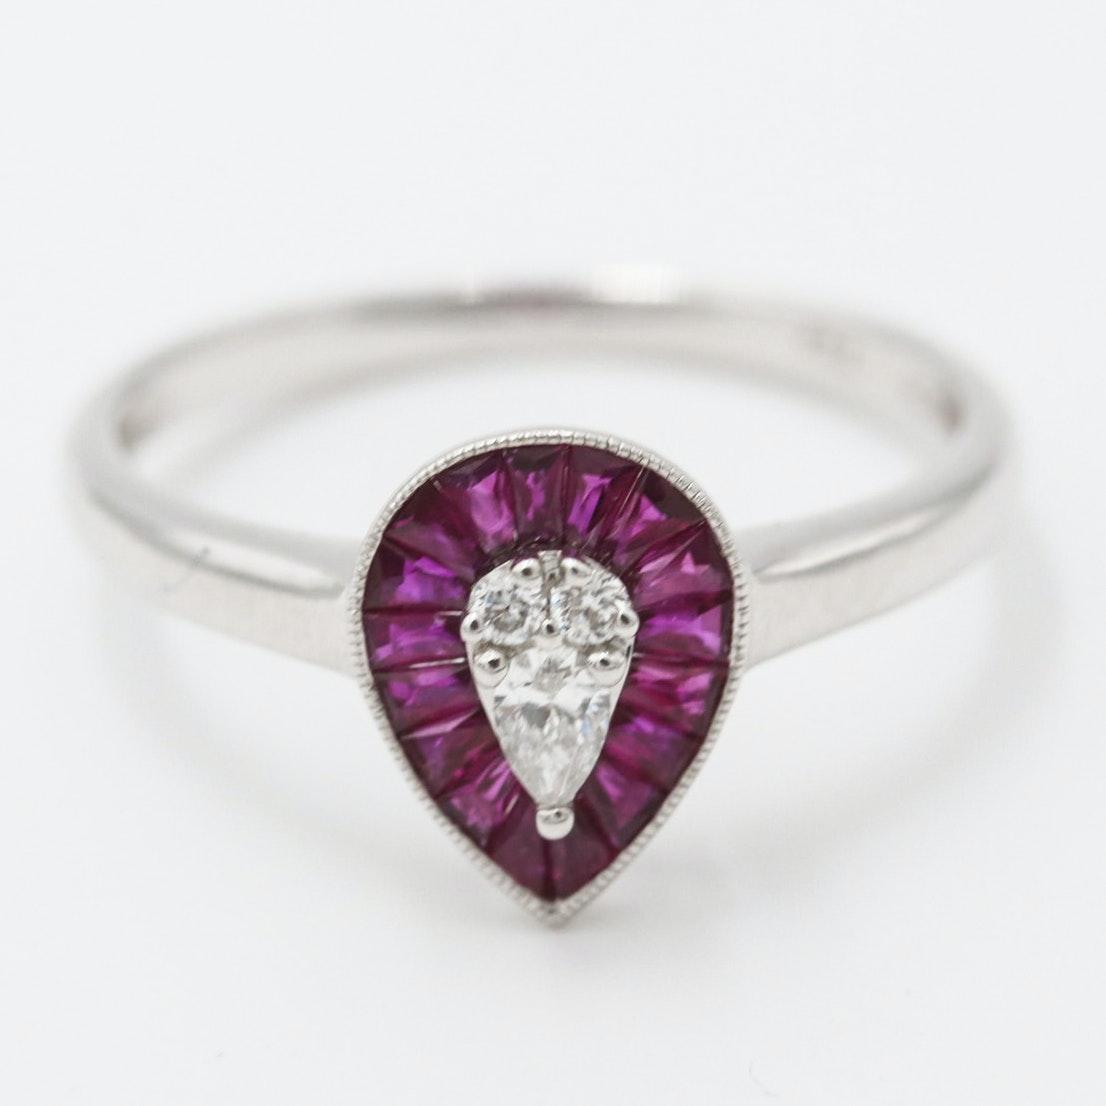 18K White Gold Diamond Ruby Ring